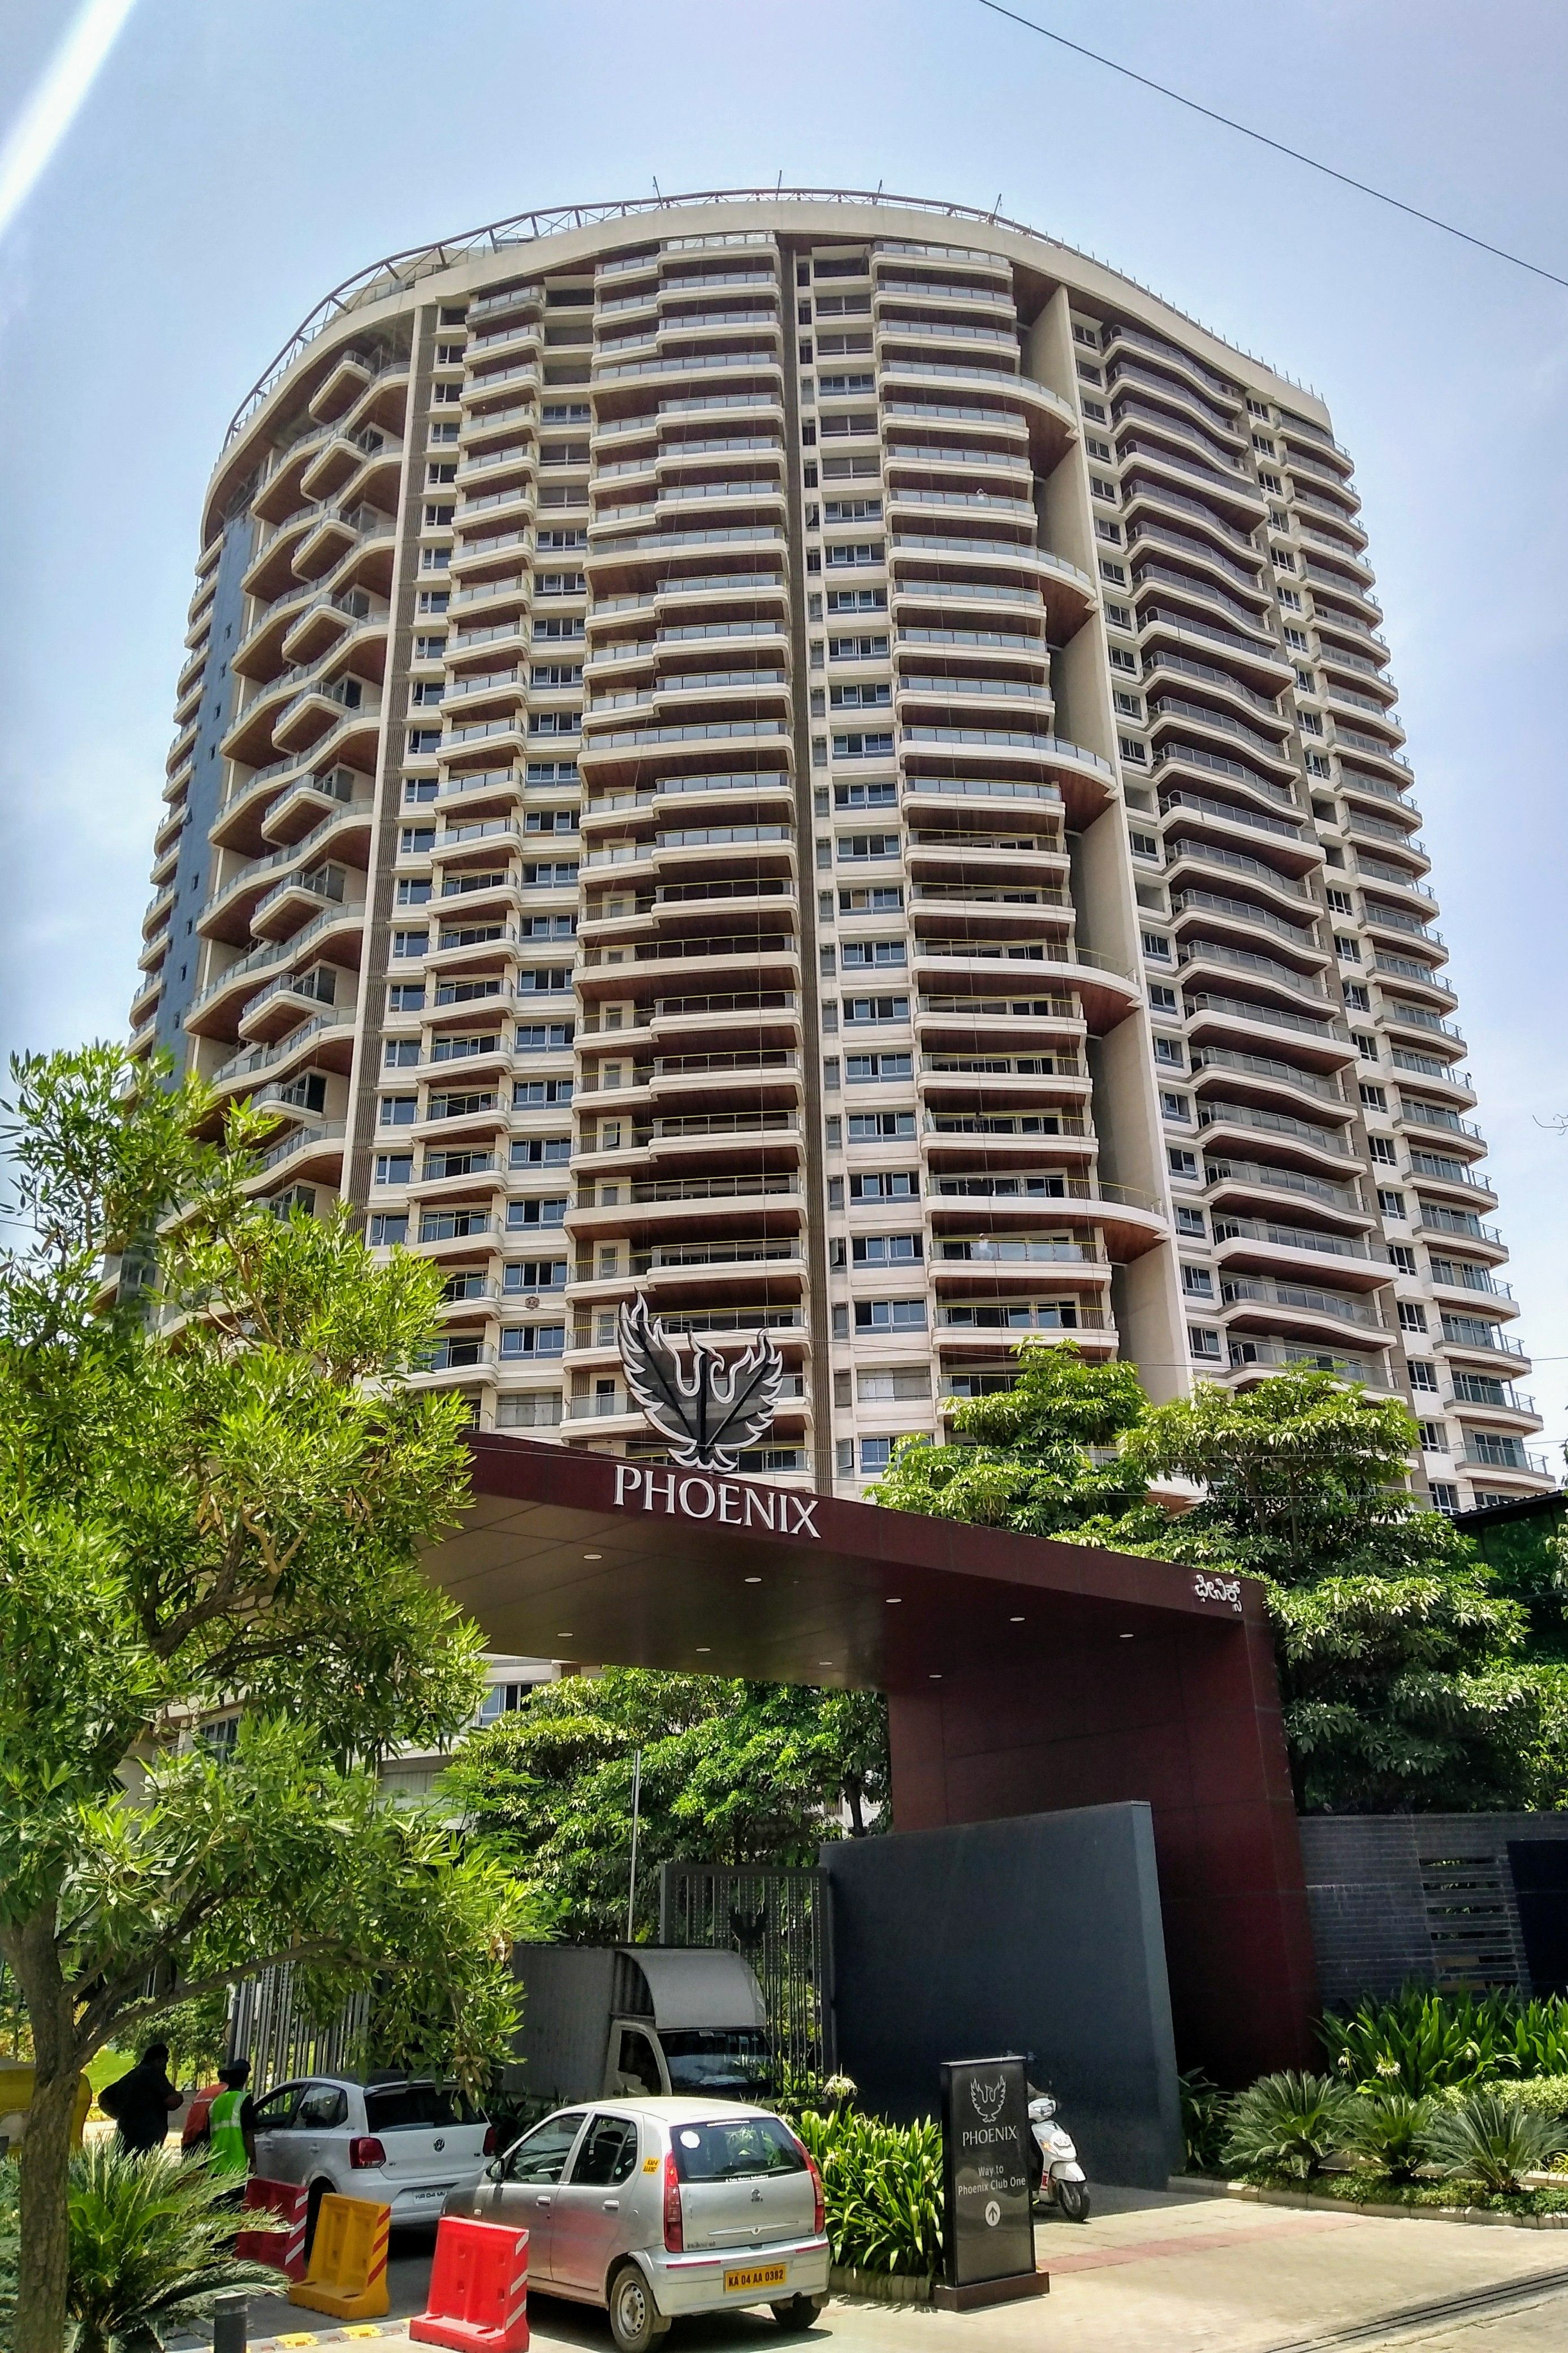 Phoenix One Bangalore West offers premium apartments in